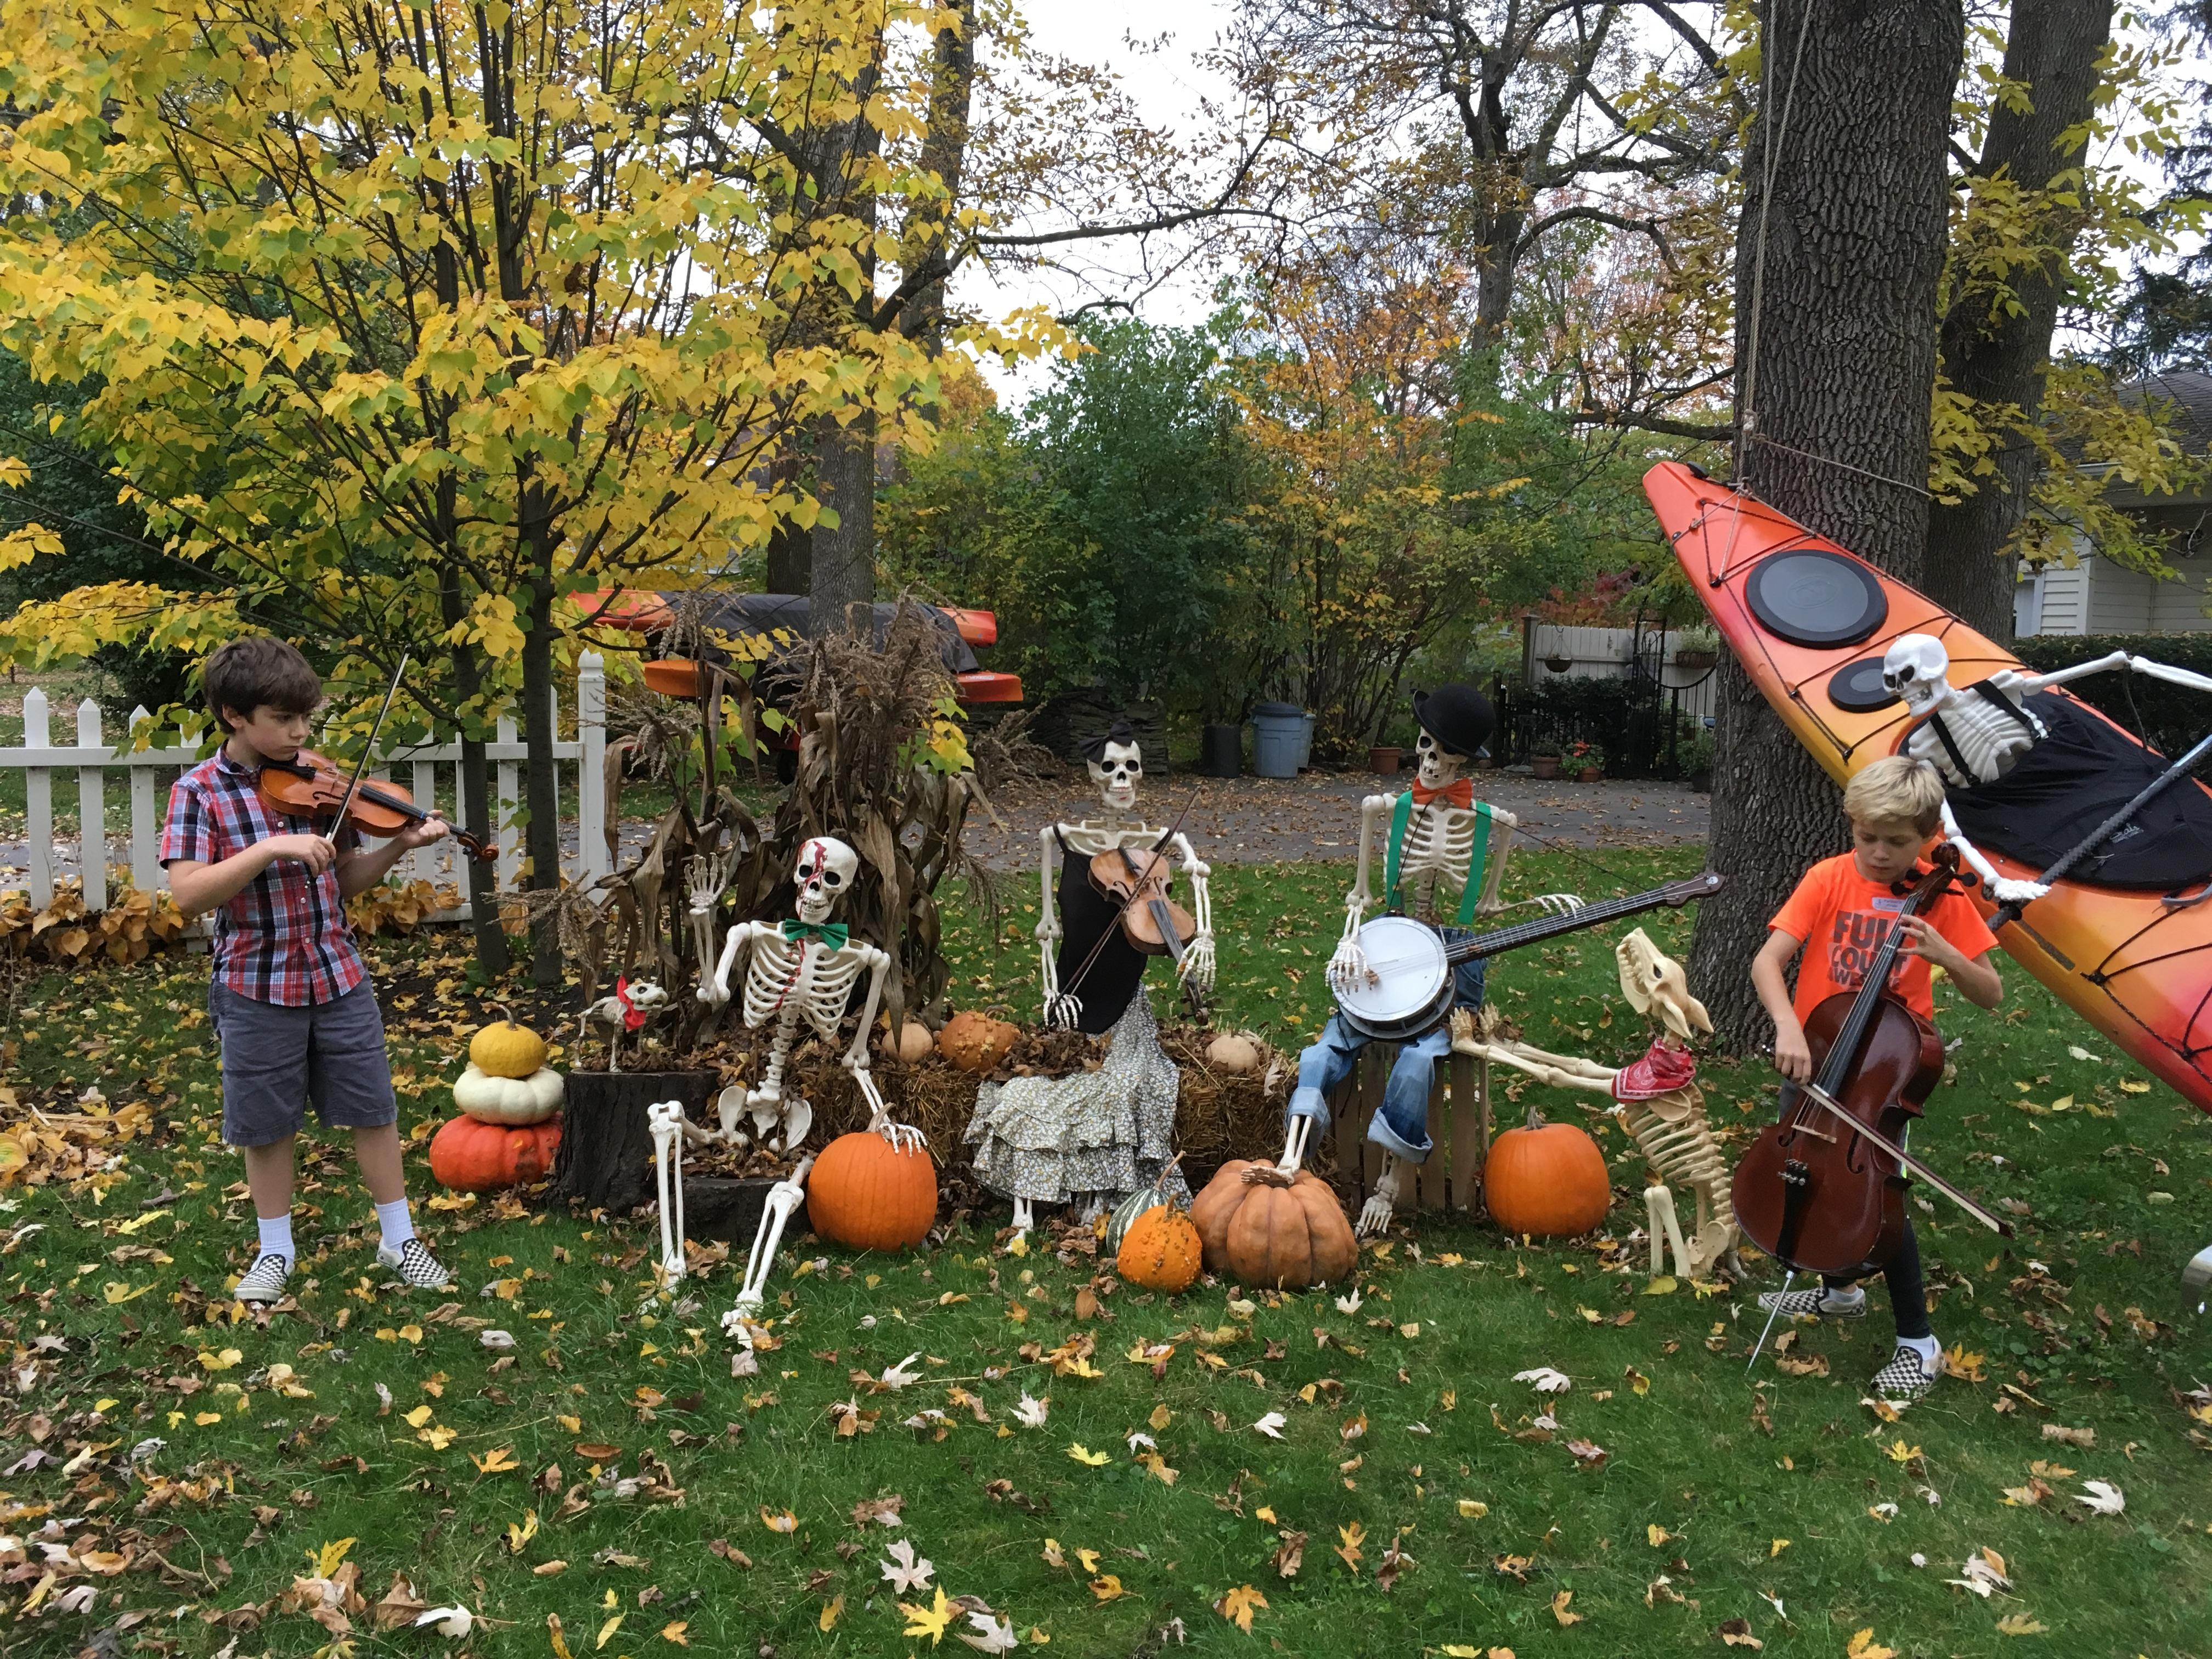 Fiddlers and skeletons